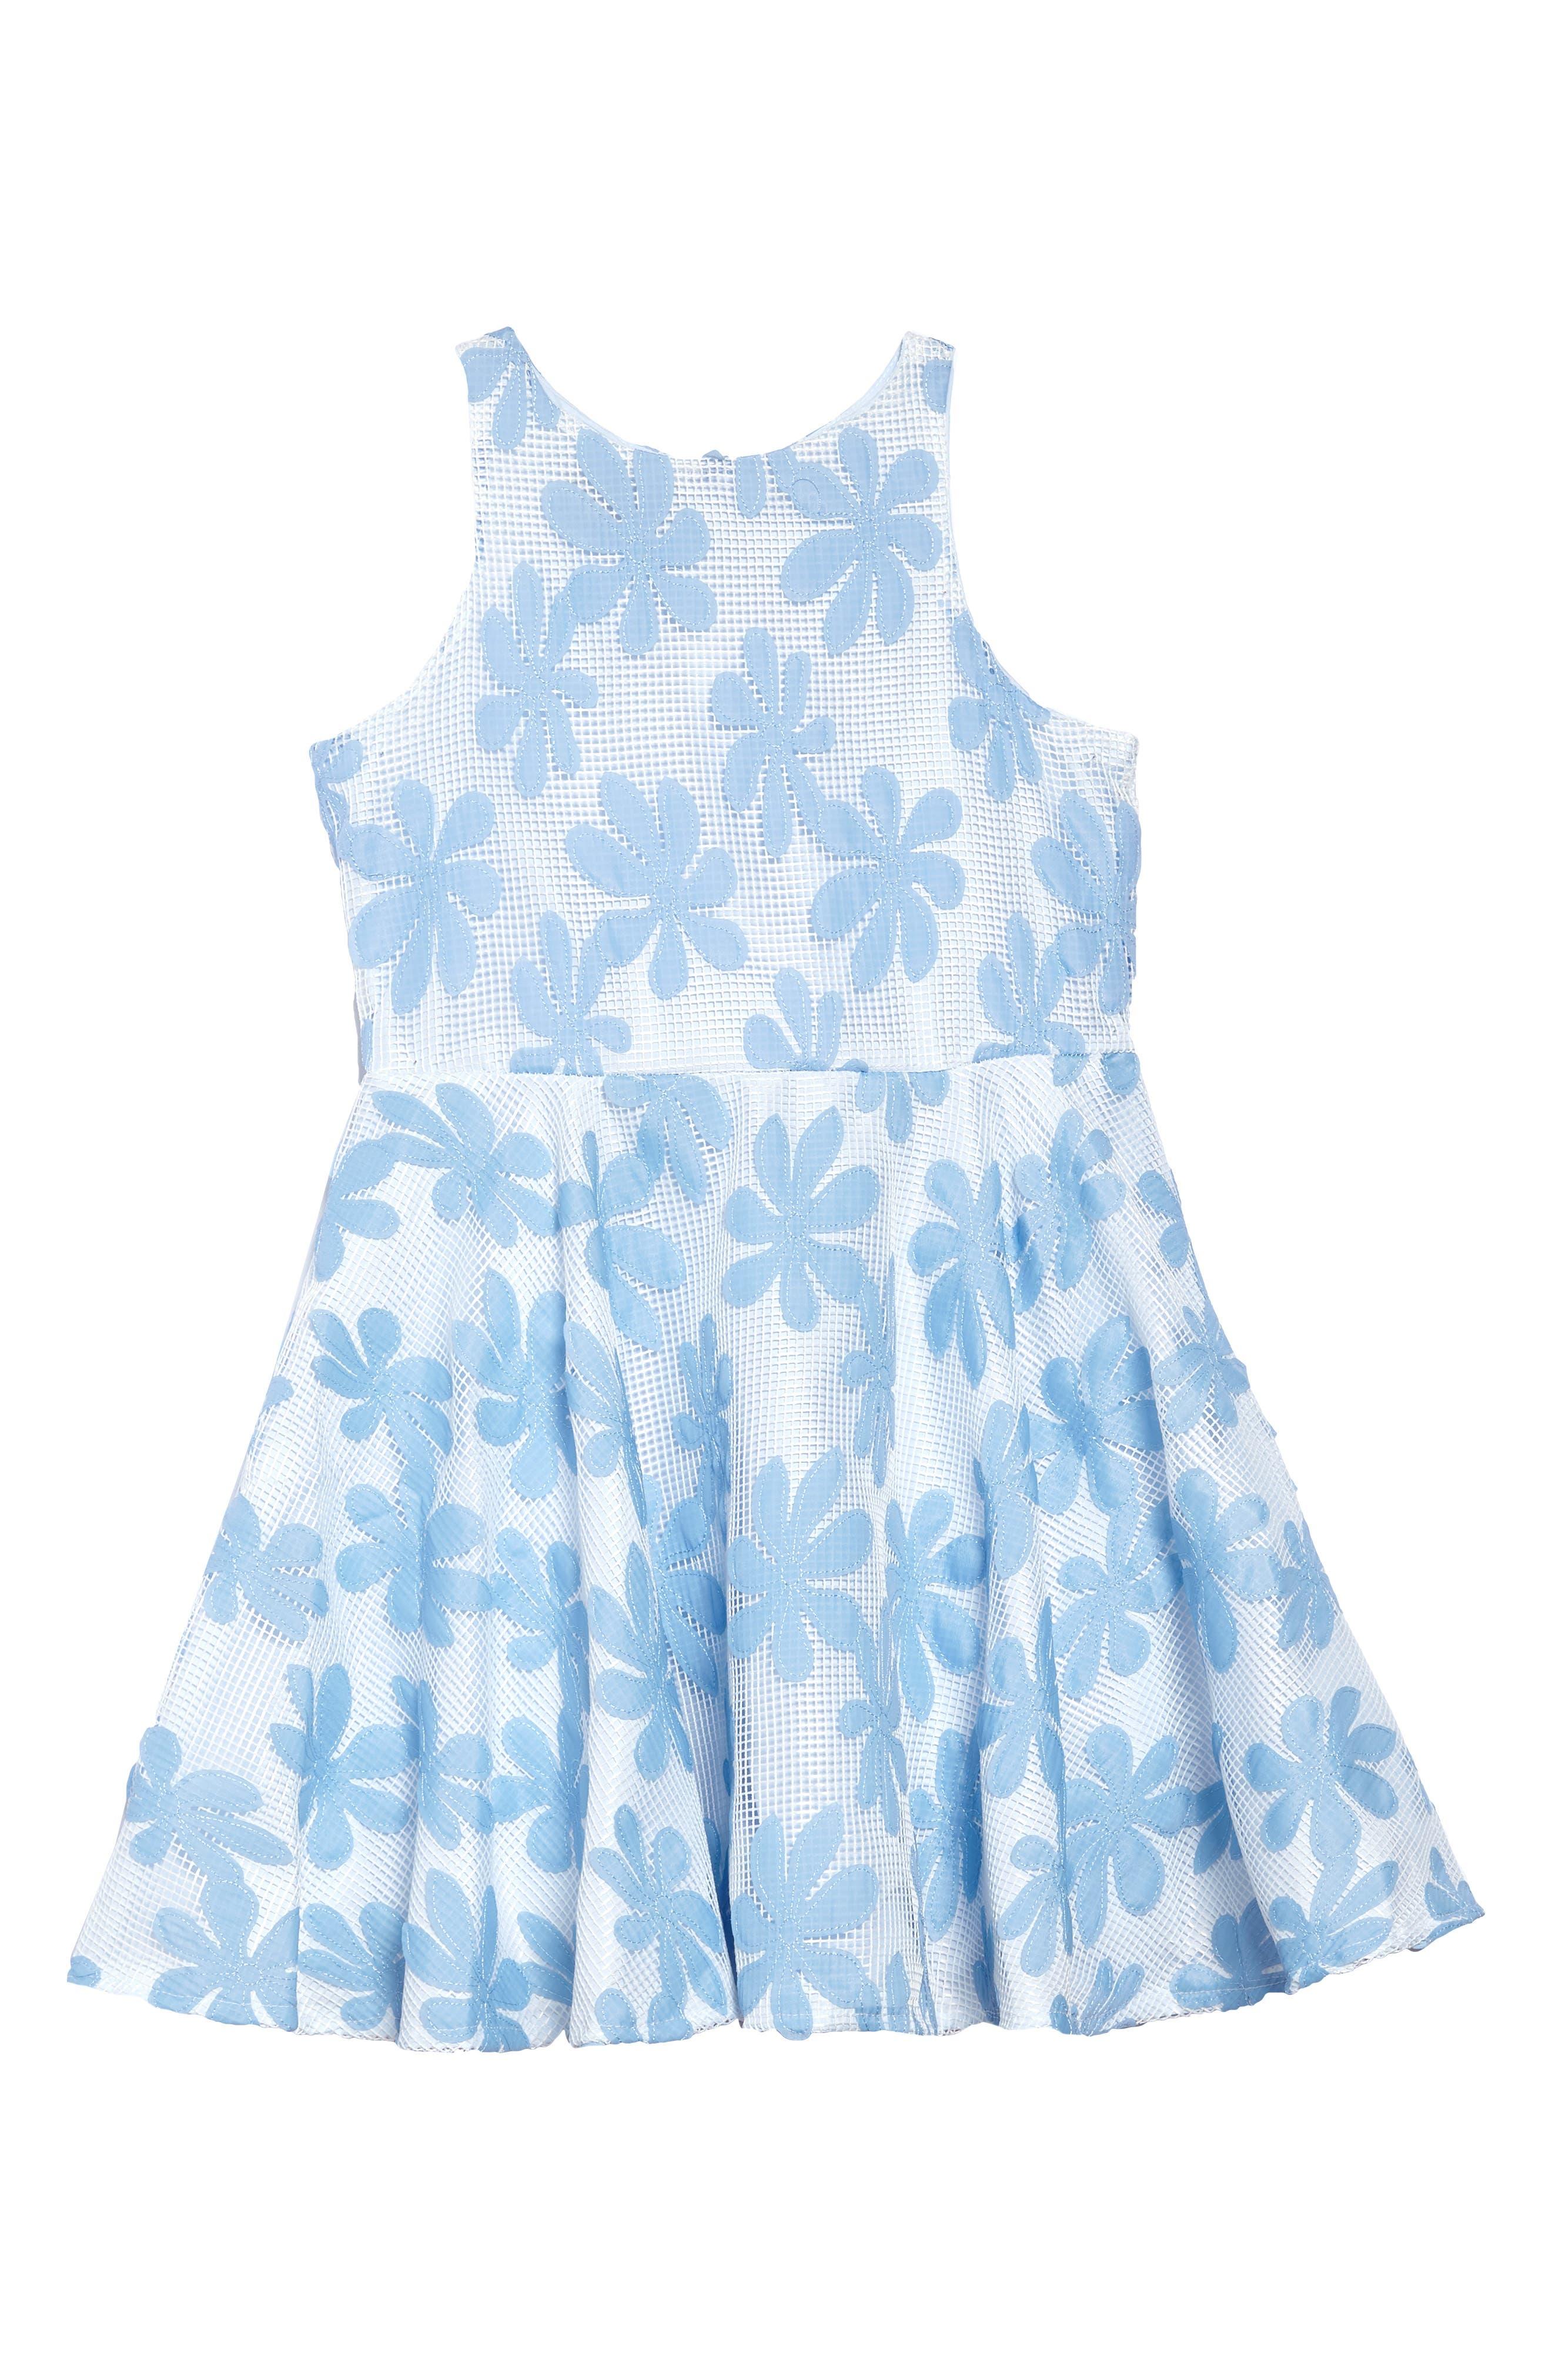 Daisy Appliqué Mesh Dress,                             Main thumbnail 1, color,                             119